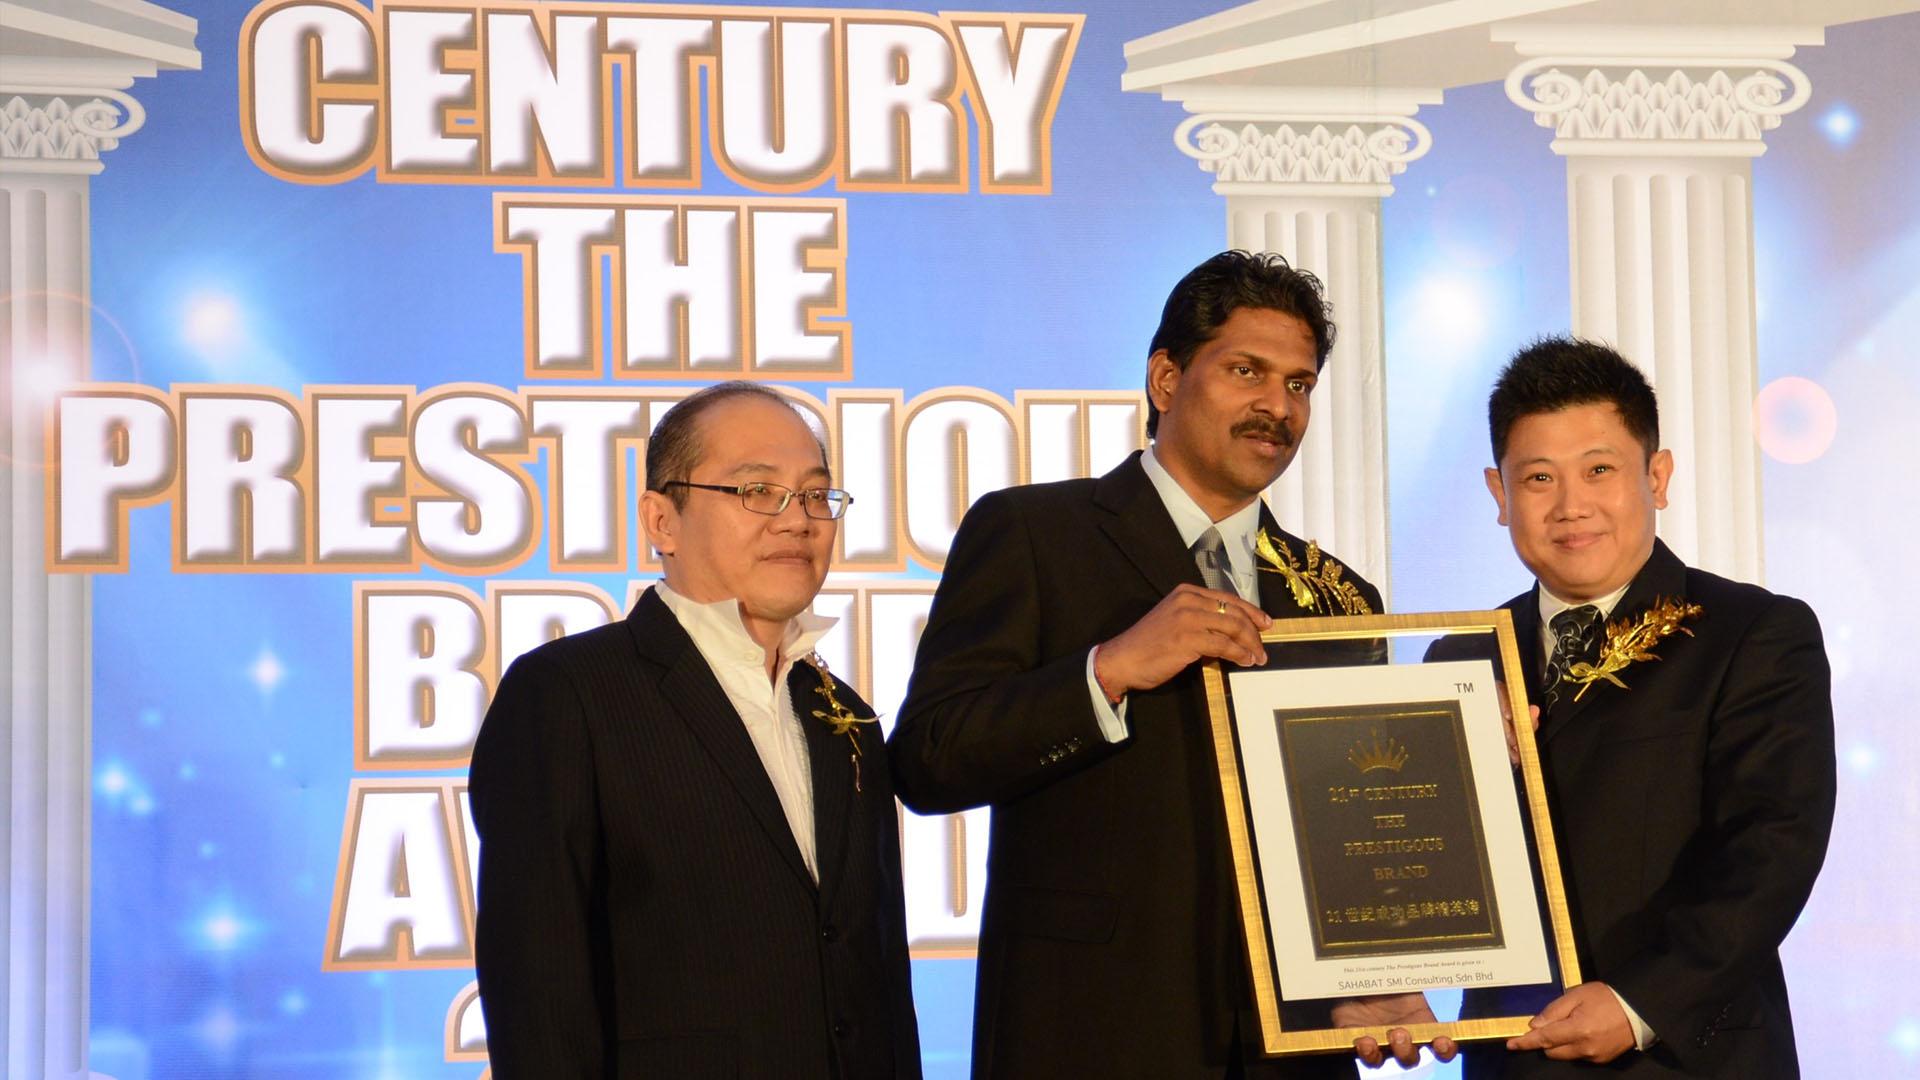 21st Century Prestigious Brand Award  20.03.2012